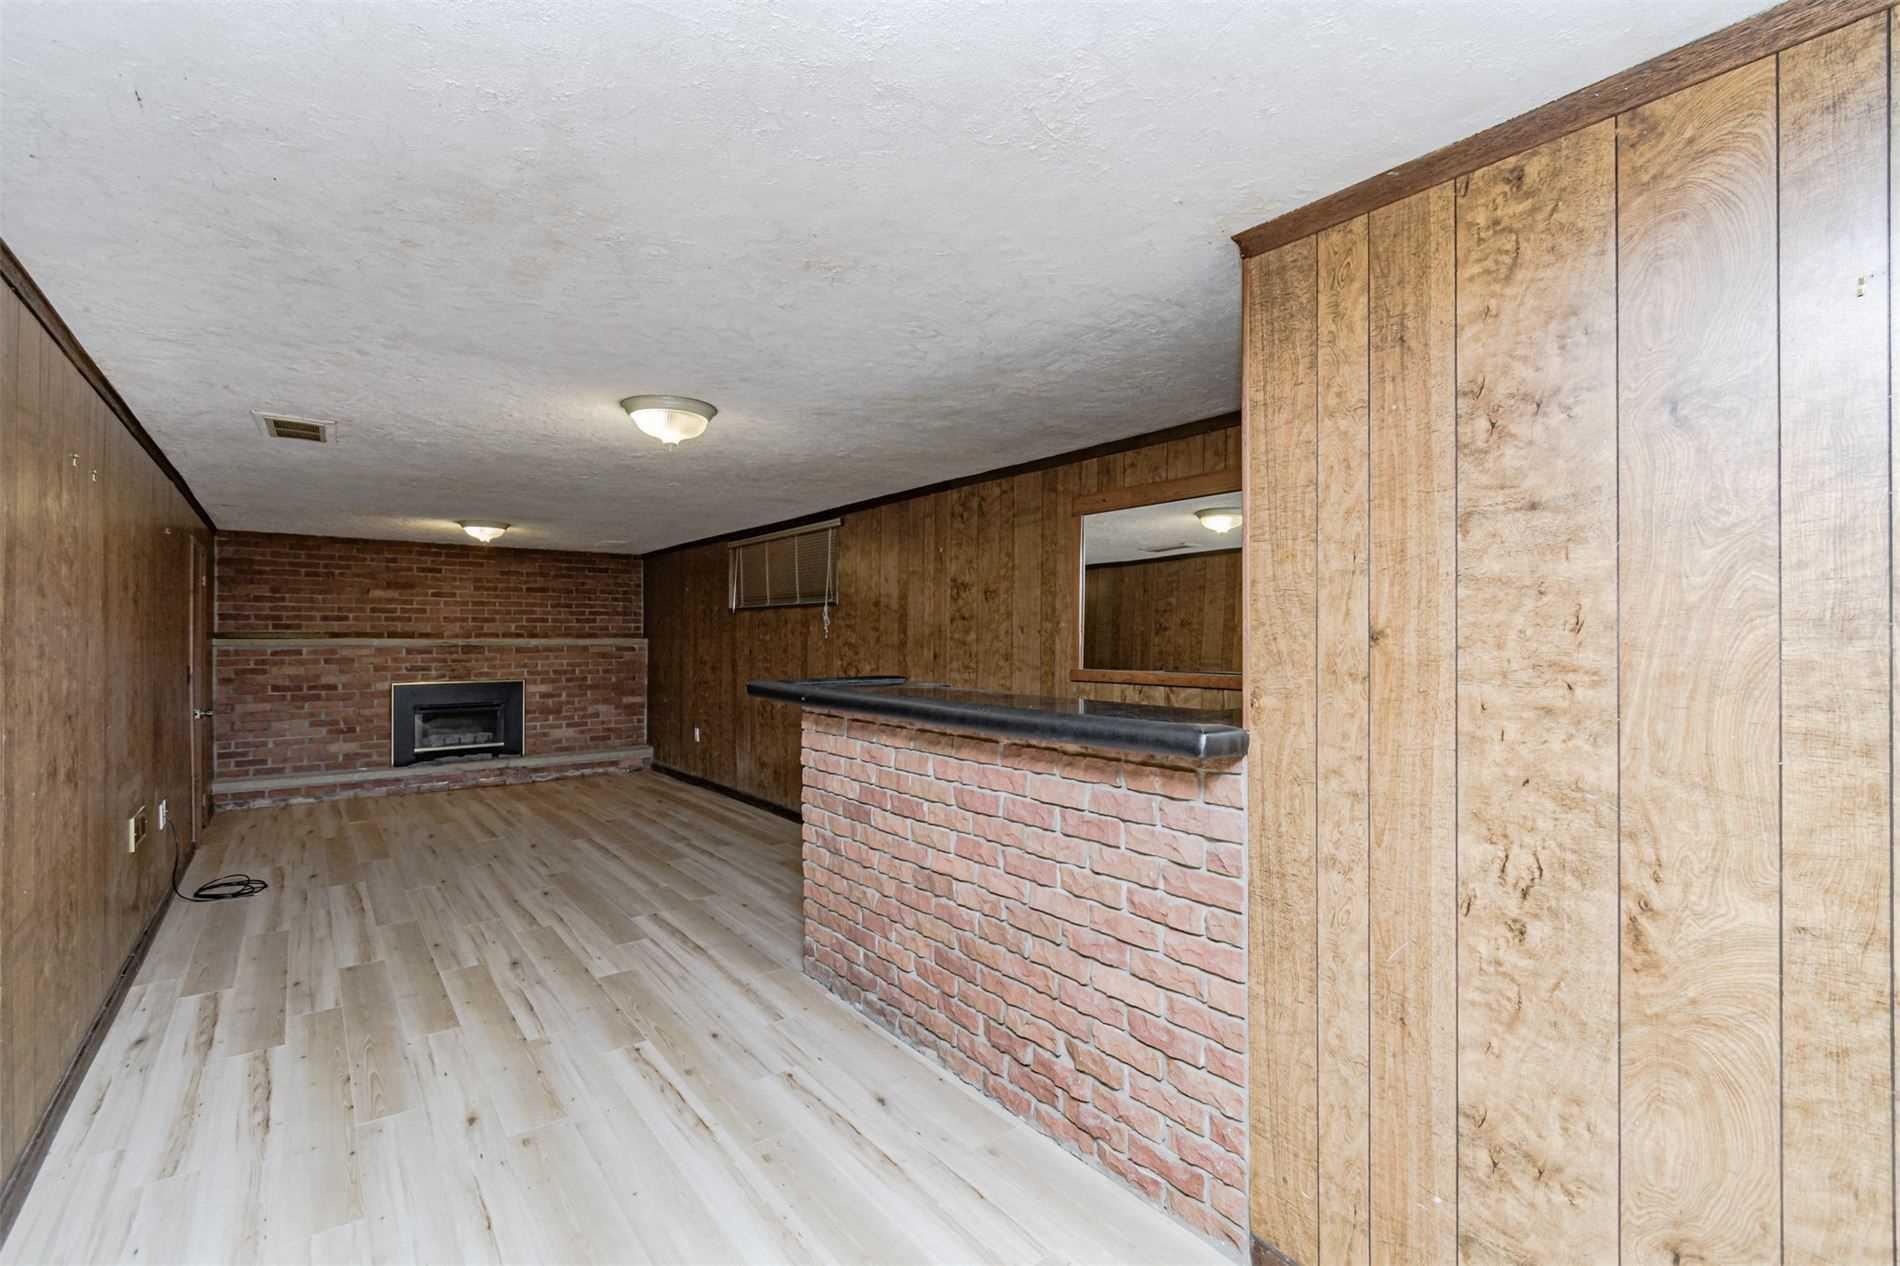 198 Fairfax Pl, Burlington, Ontario L7L4S8, 3 Bedrooms Bedrooms, 6 Rooms Rooms,3 BathroomsBathrooms,Detached,For Sale,Fairfax,W5352631